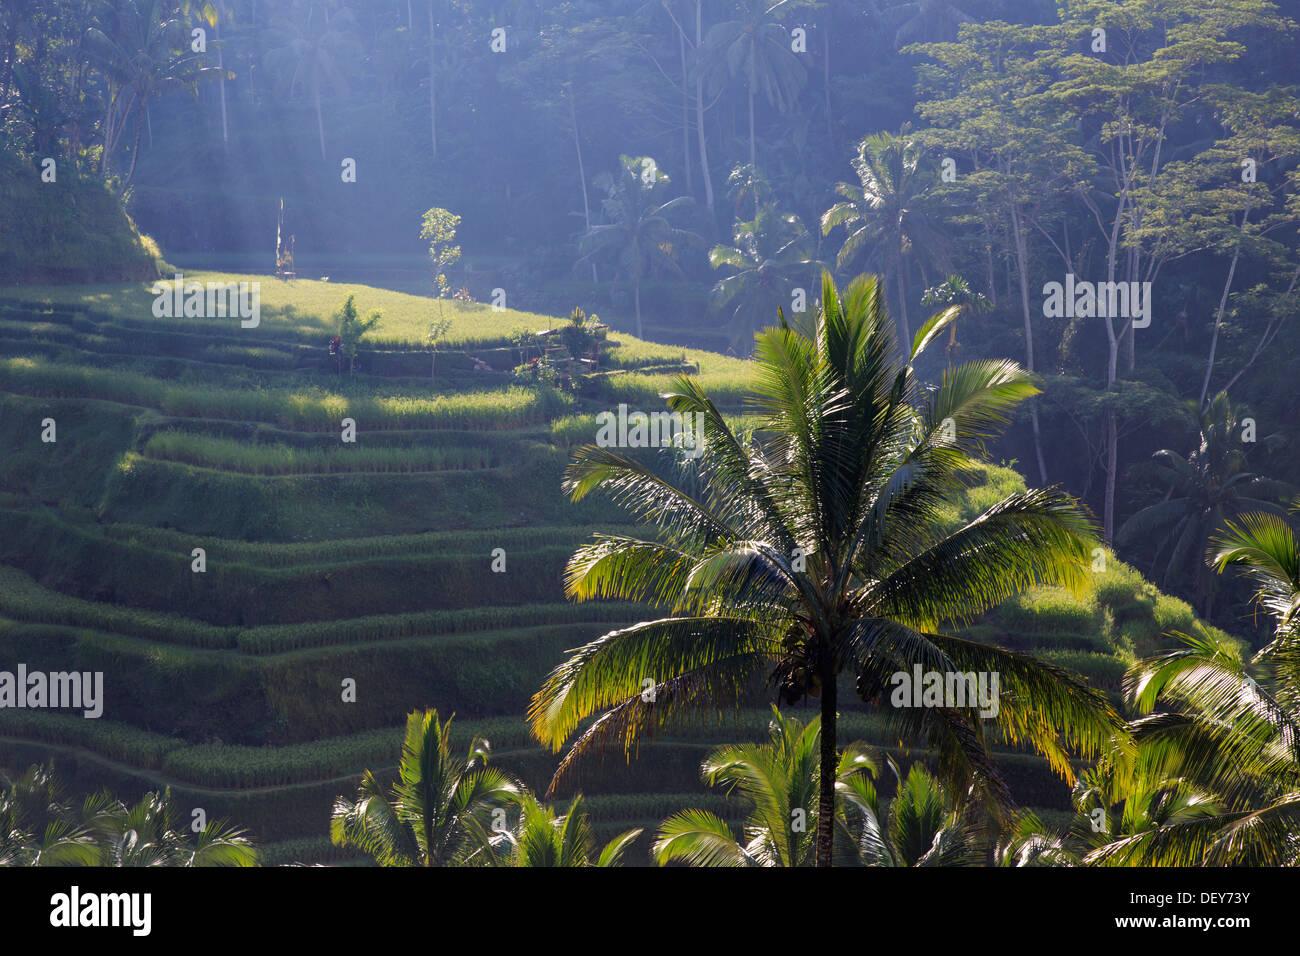 Indonesia, Bali, Ubud, Ceking Rice Terraces - Stock Image